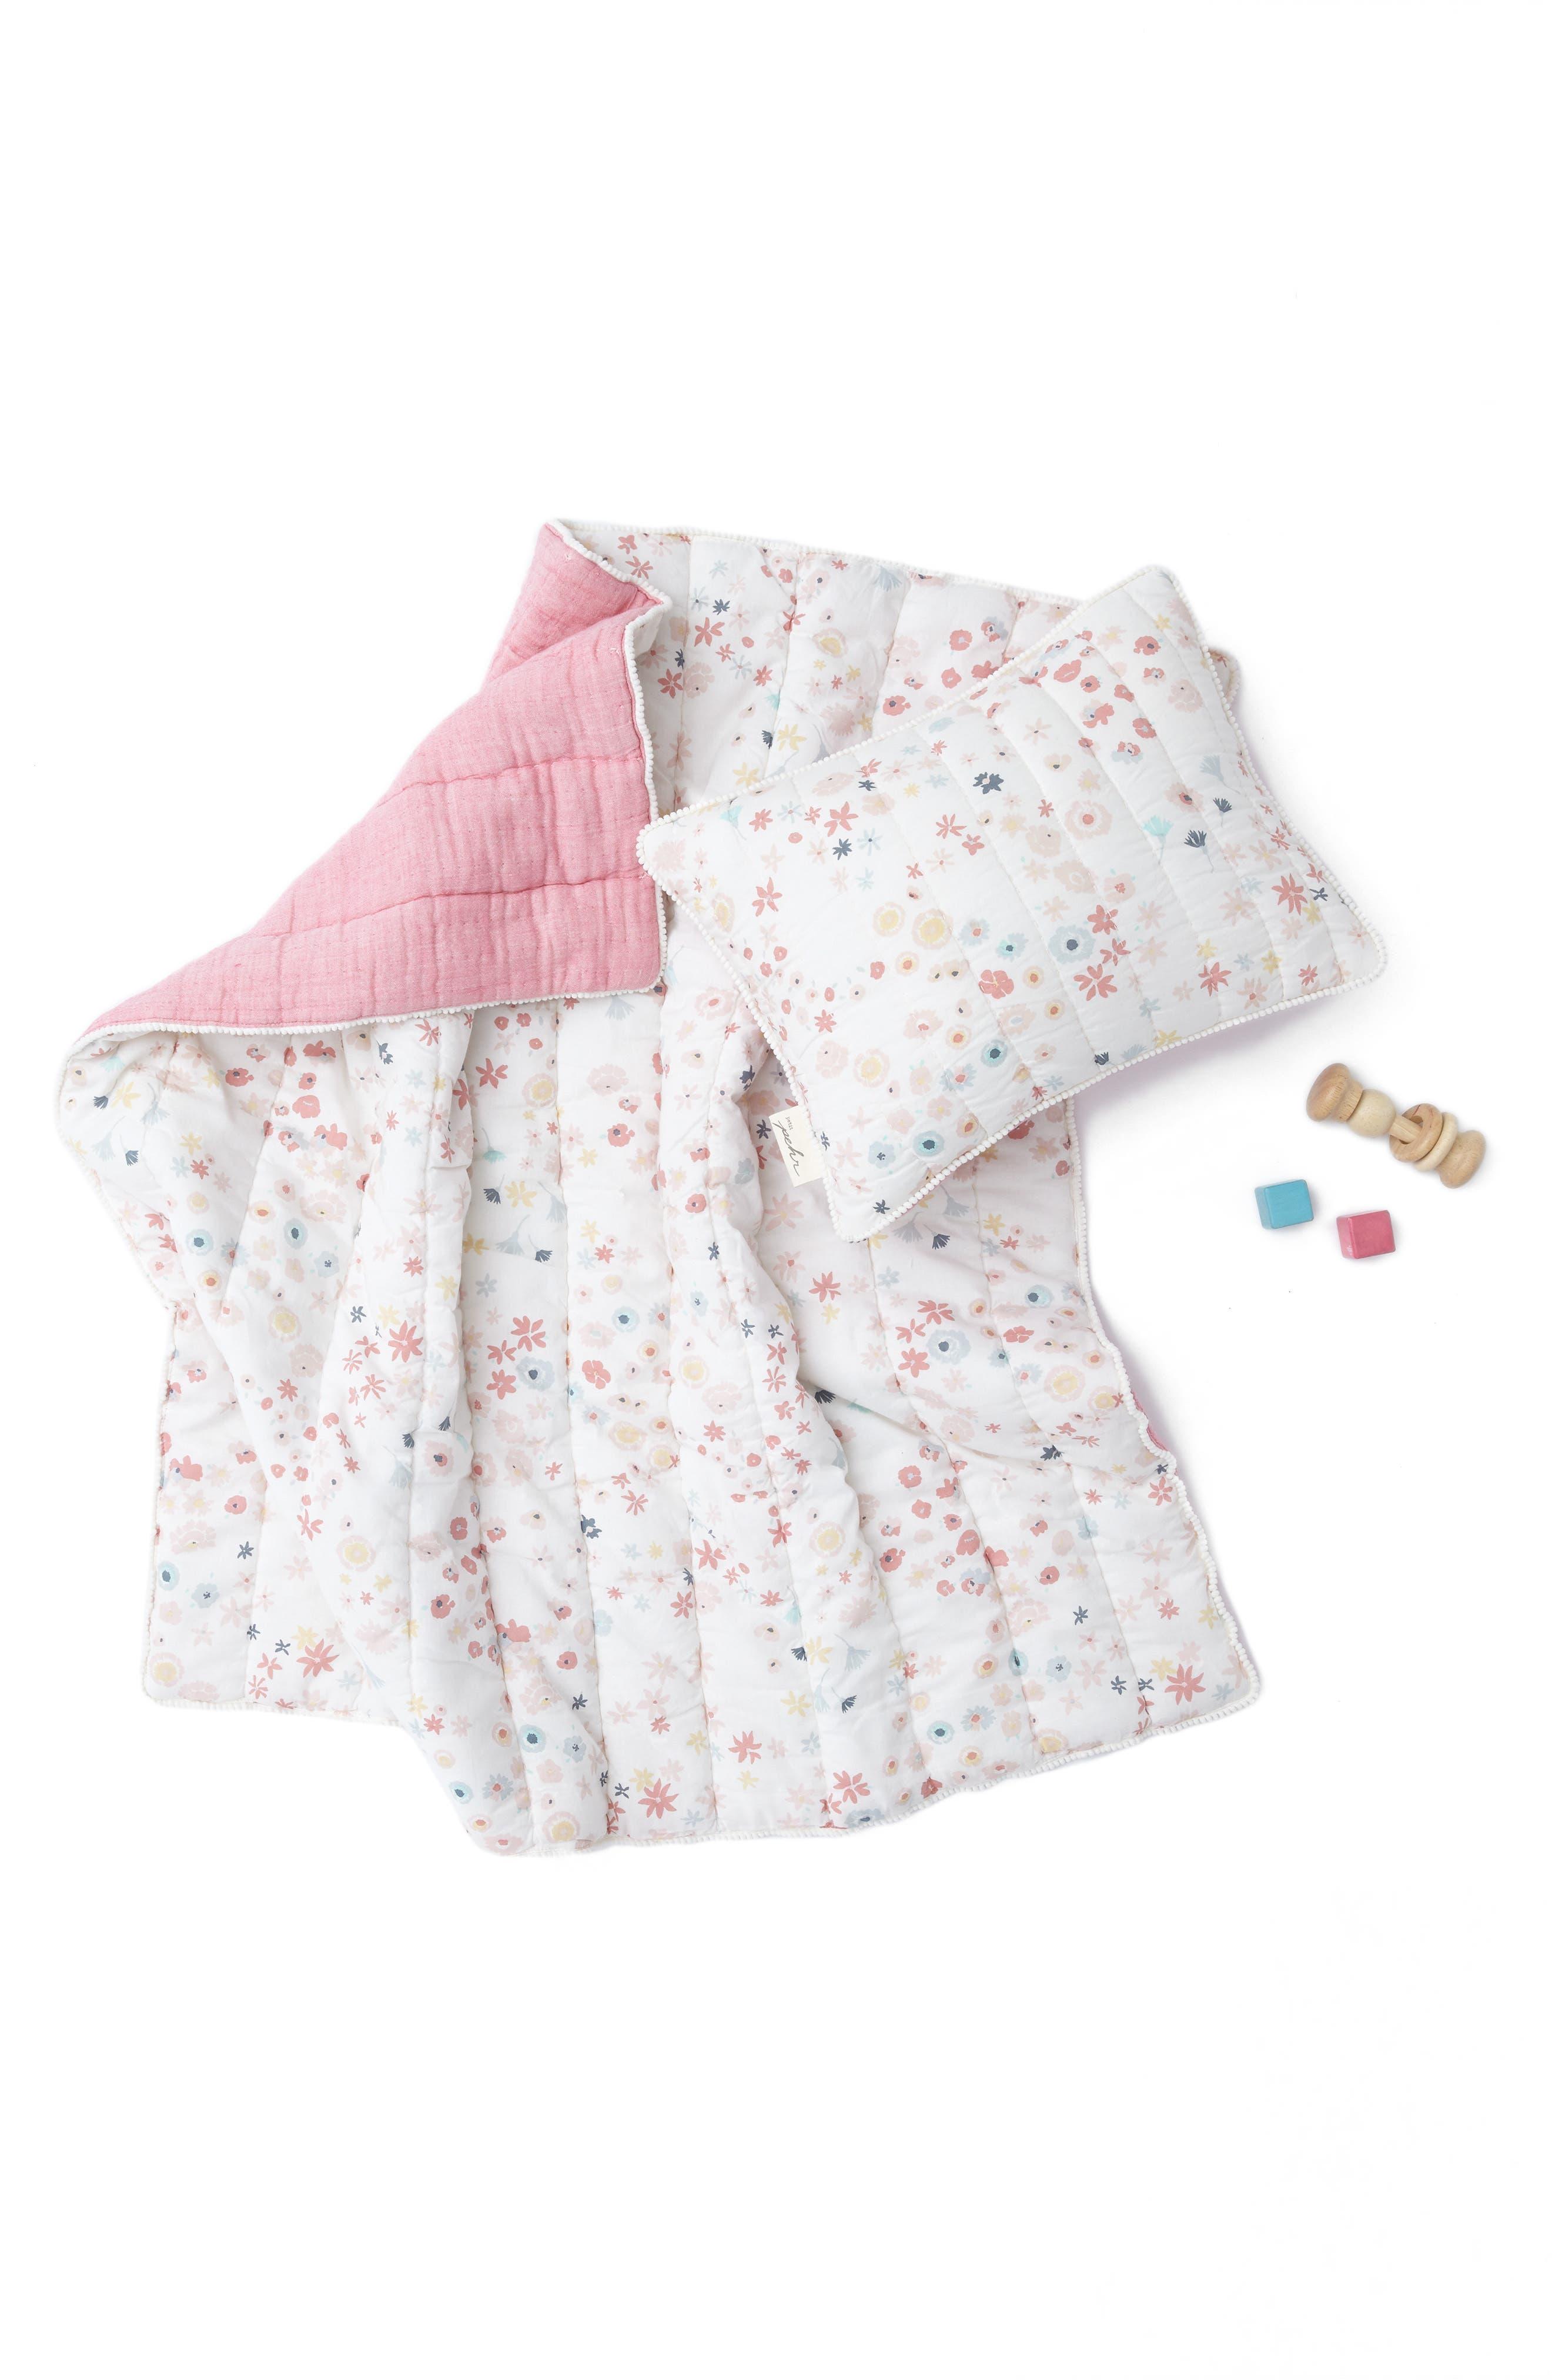 Showers Crib Sheet, Swaddle, Blanket & Pillow Set,                             Alternate thumbnail 4, color,                             PINK